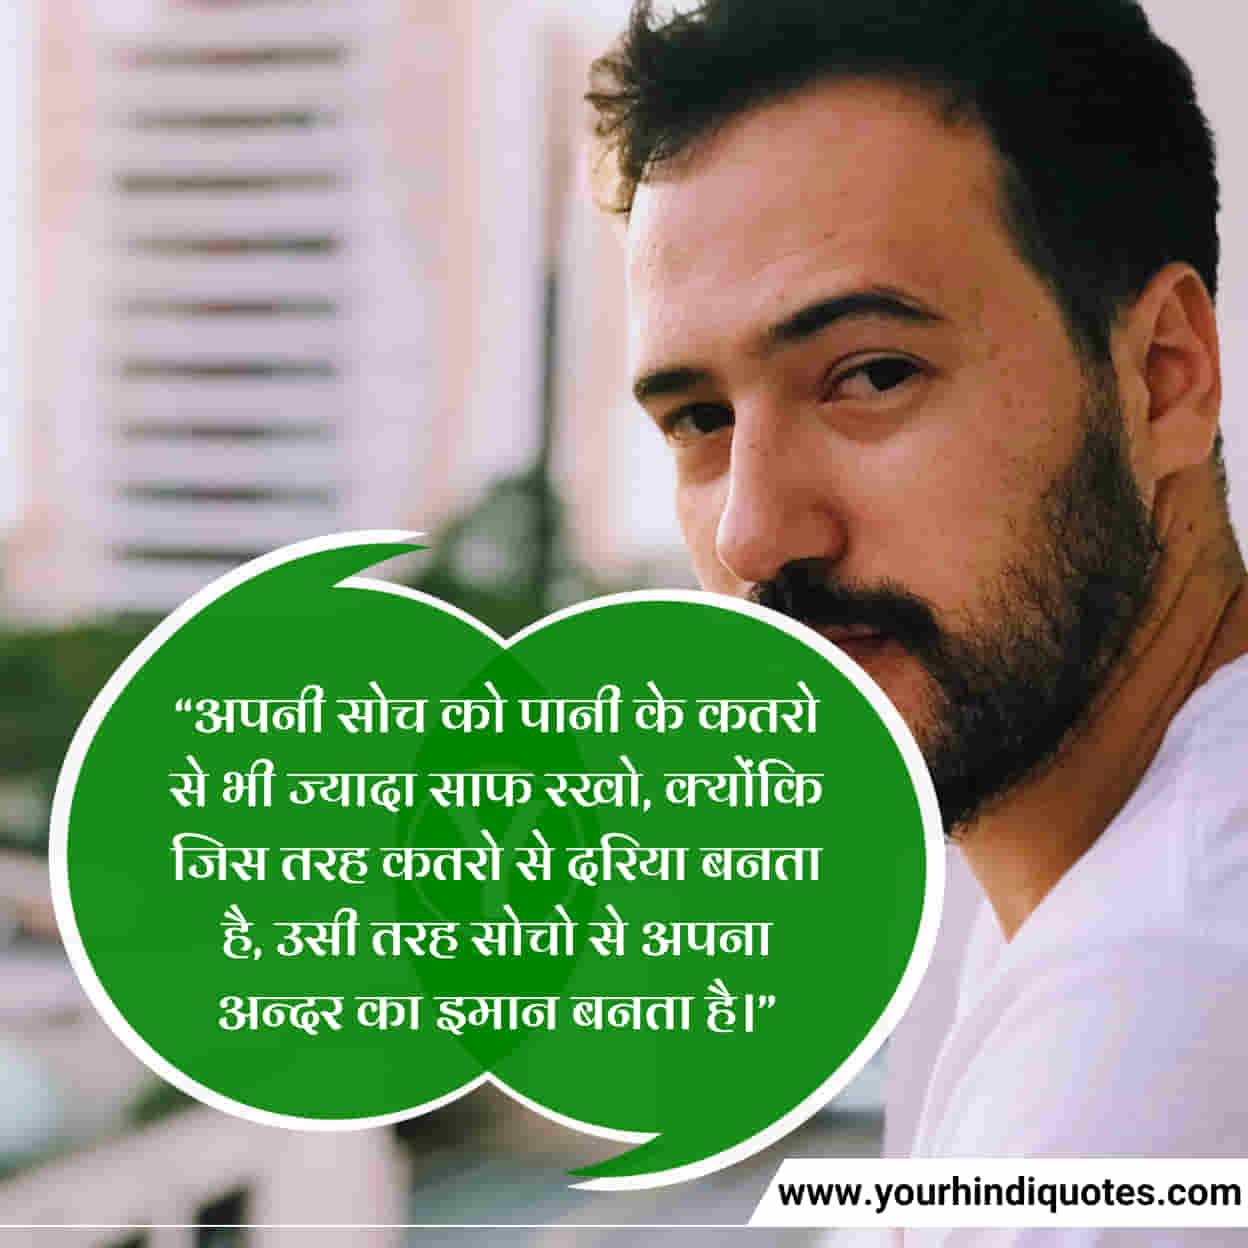 Best Motivational Shayari for Students In Hindi